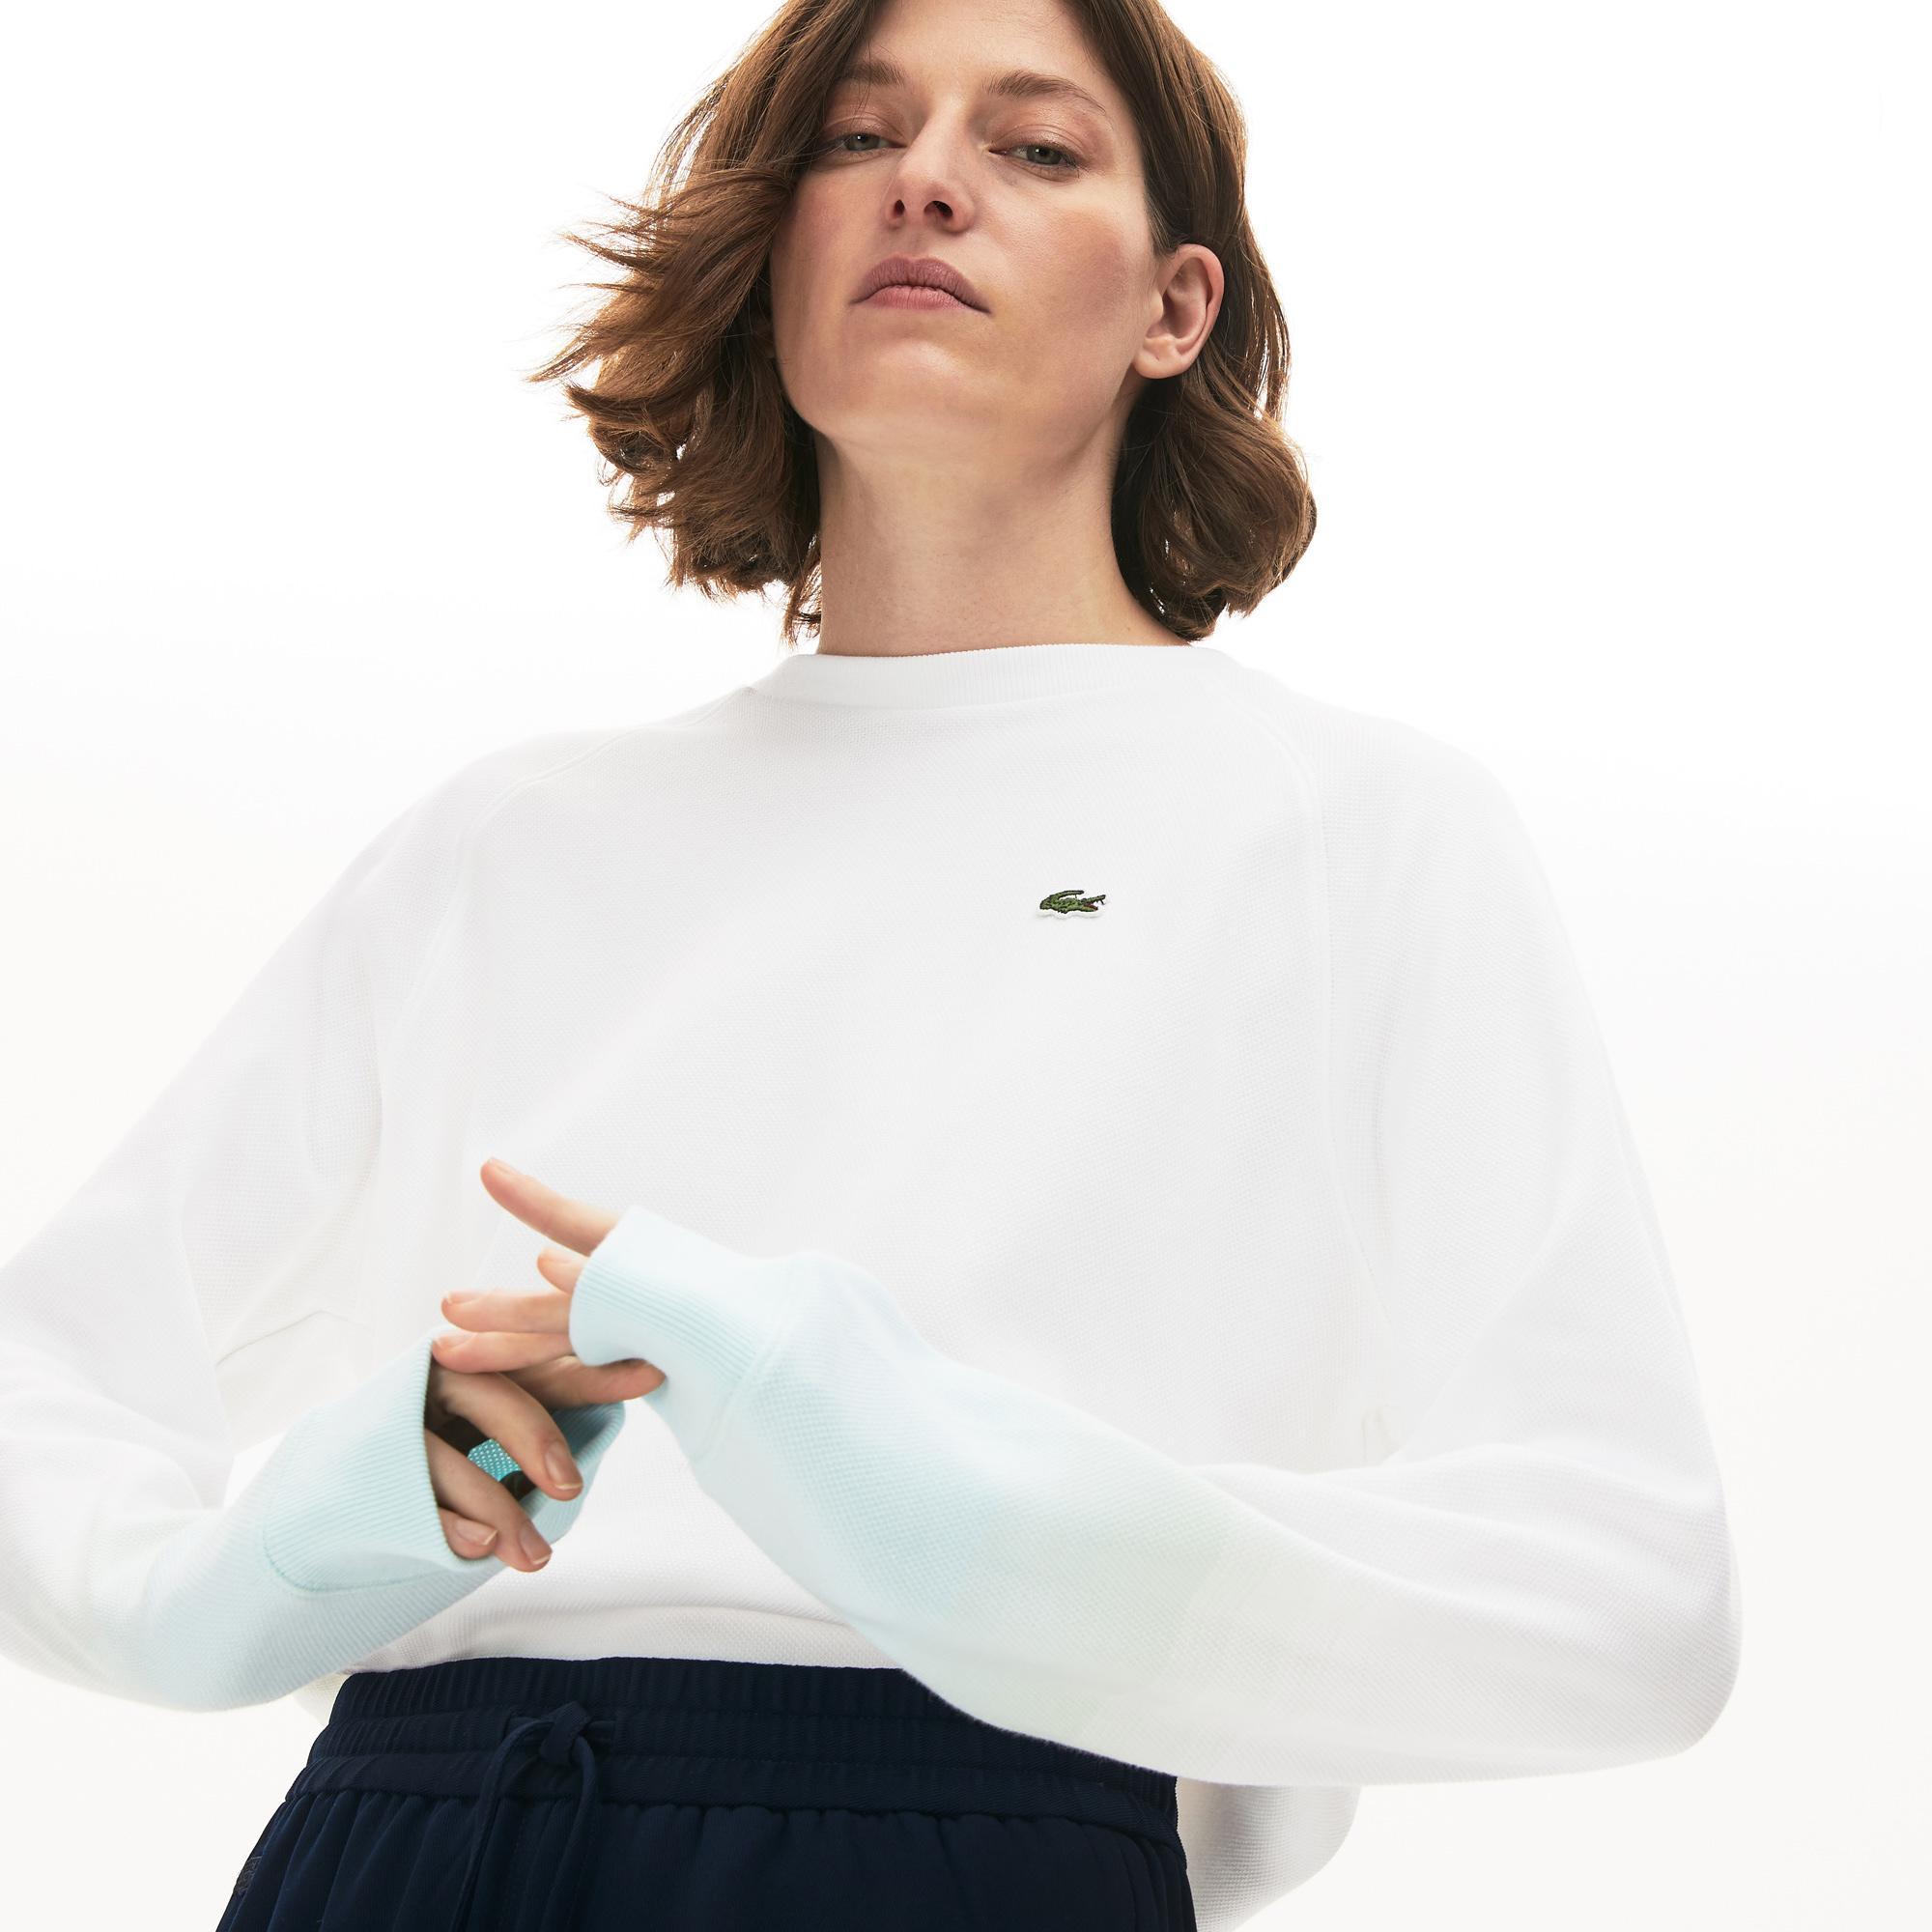 Lacoste Women's Made İn France Crew Neck Organic Cotton Sweatshirt